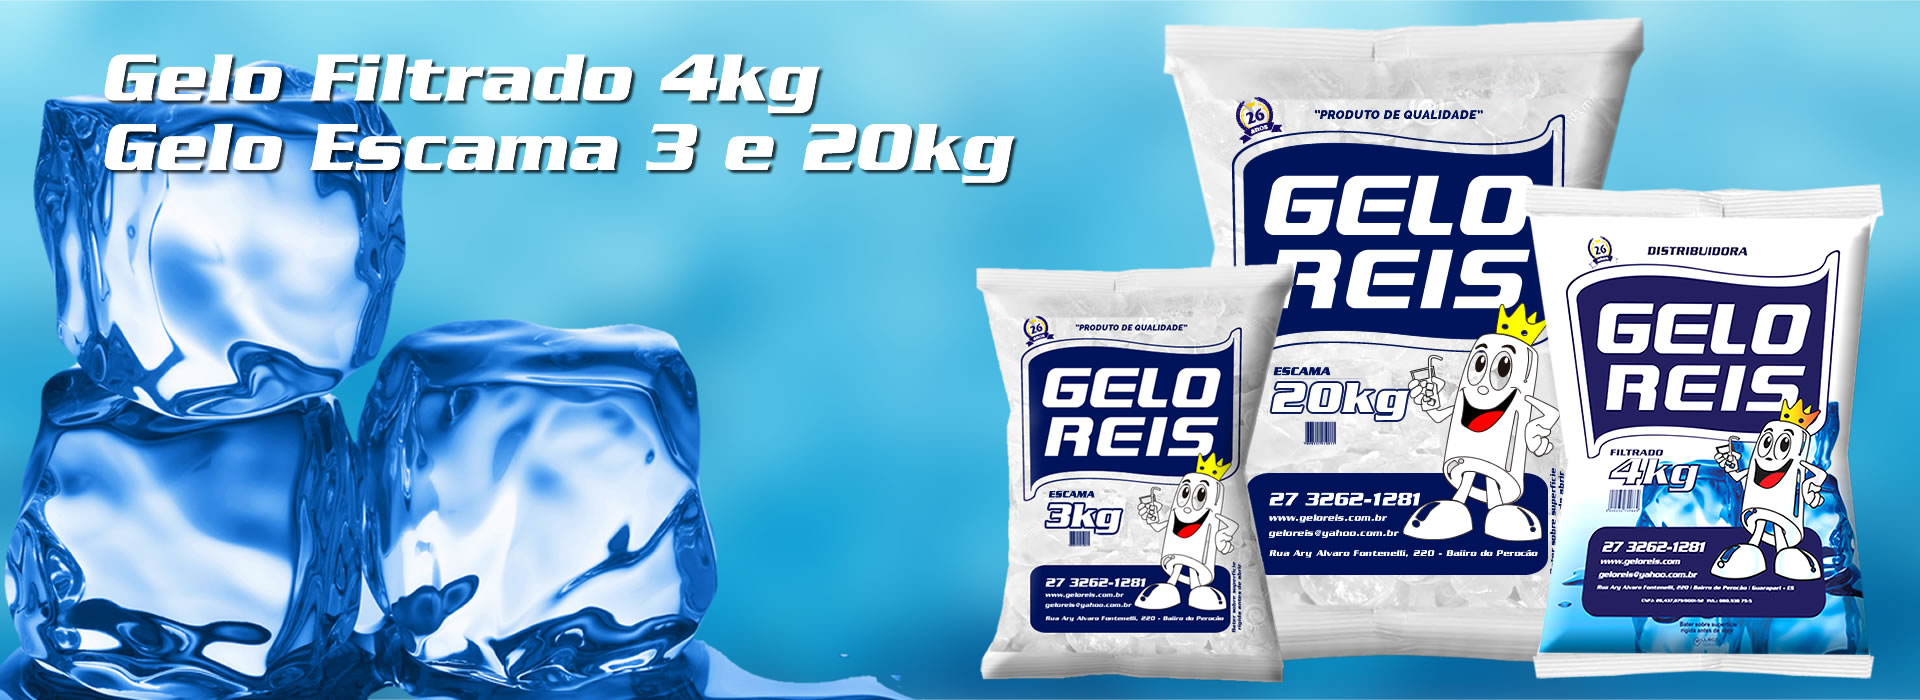 gelo-filtrado-guarapari